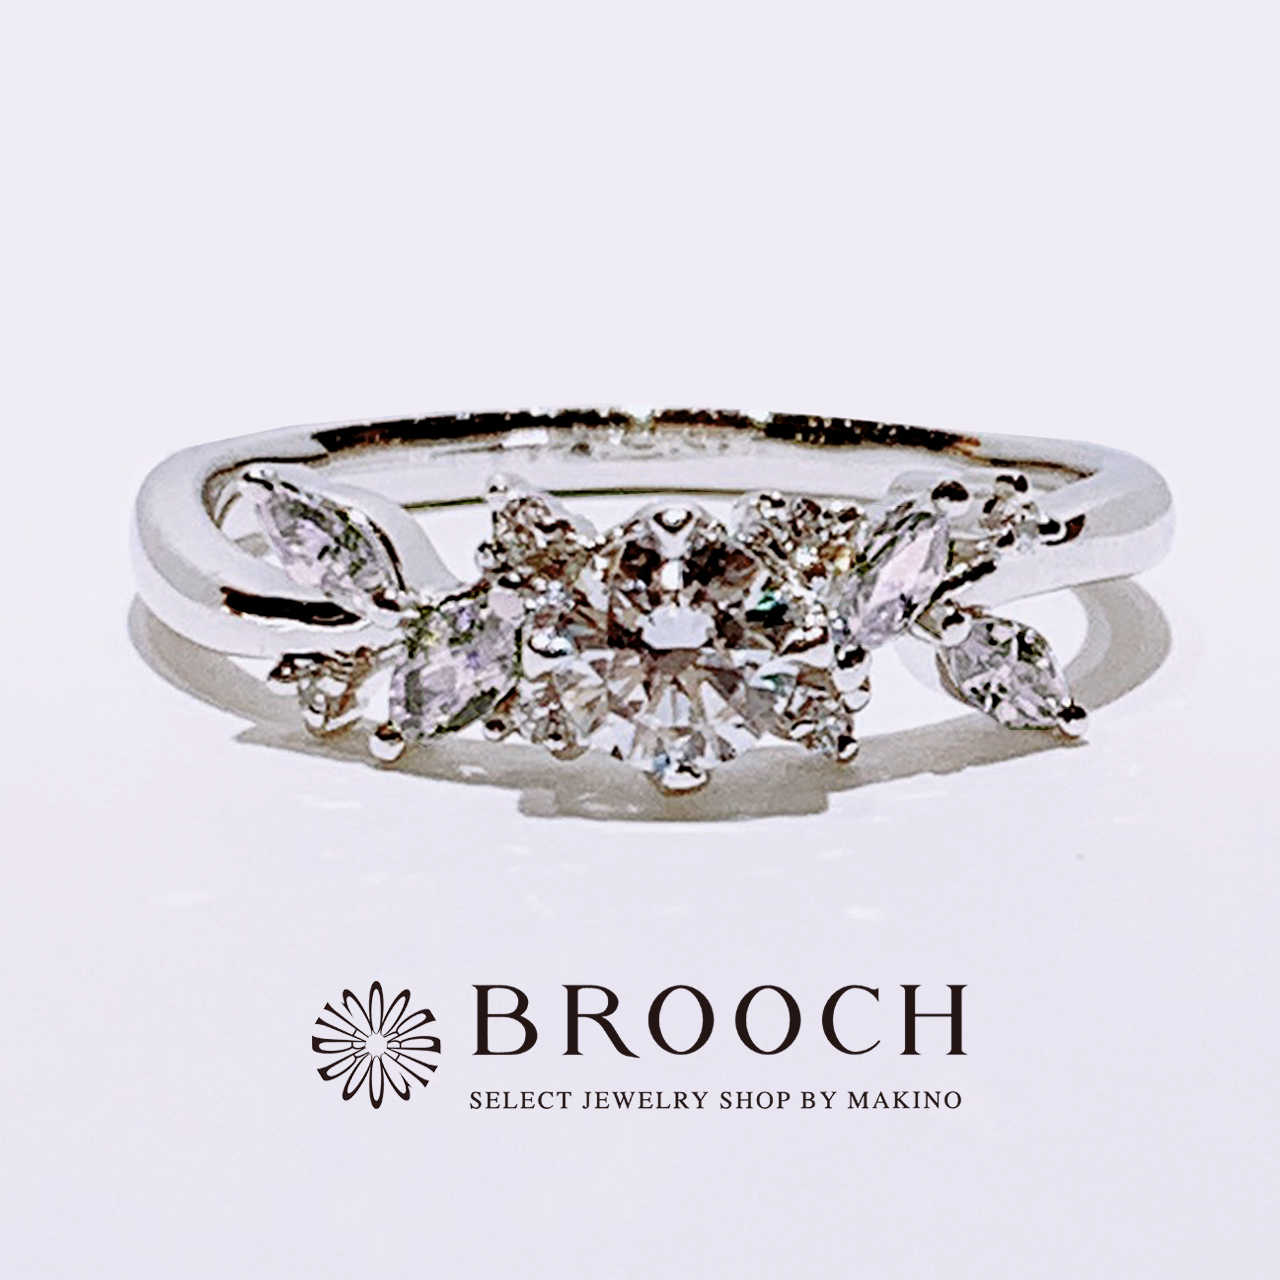 BROOCH 婚約指輪 エンゲージリング 花冠風デザイン